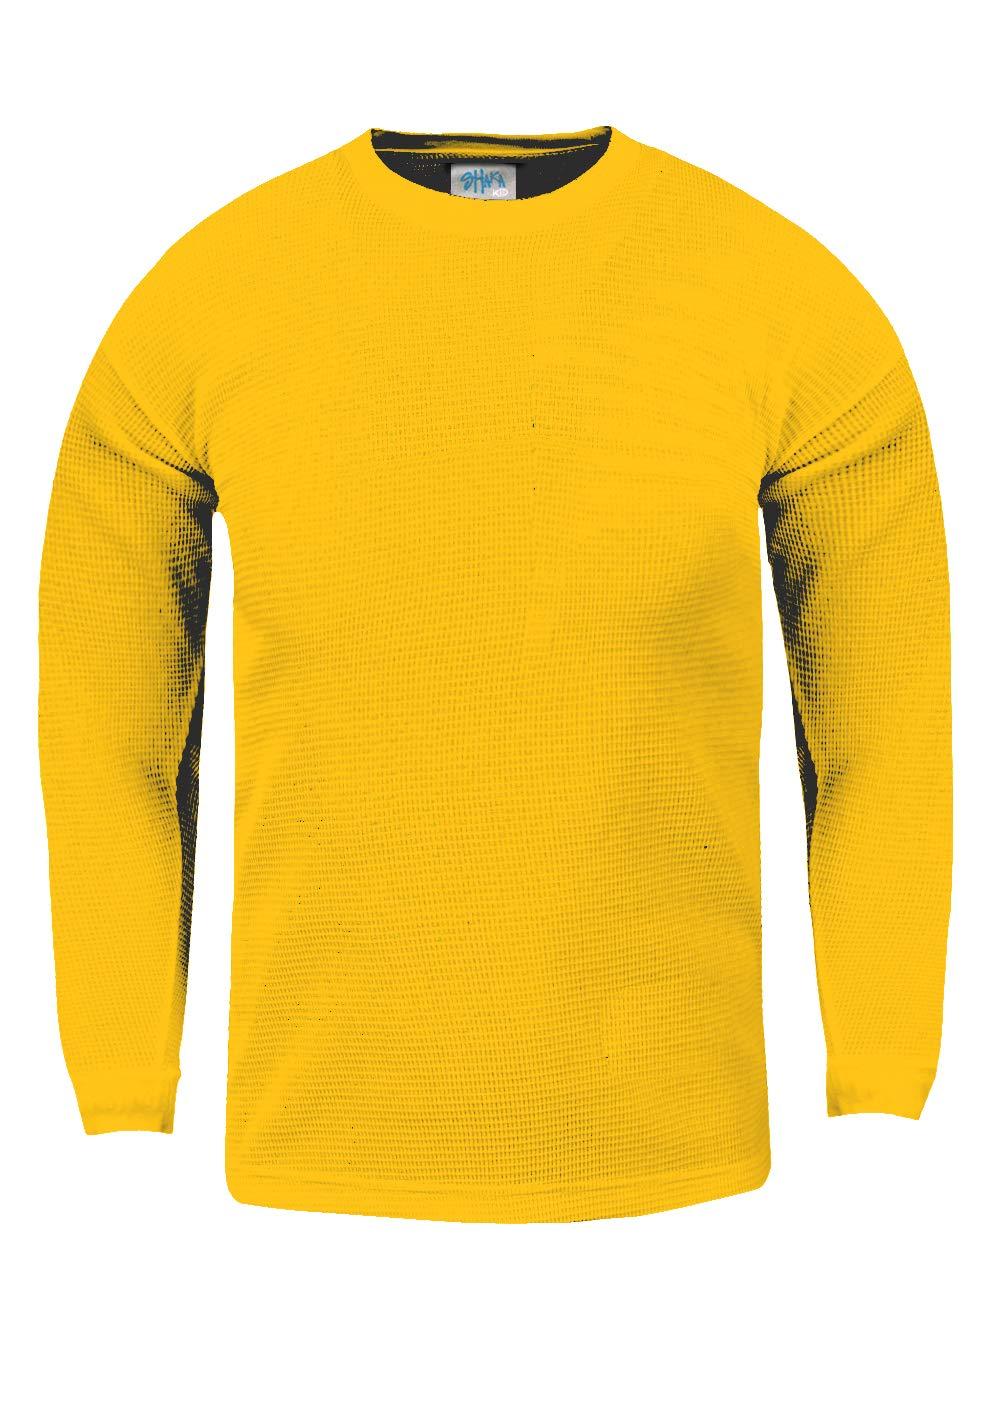 Shaka Wear KTC16_XS Thermal Long Sleeve Crewneck Waffle Shirt Yellow XS by Shaka Wear